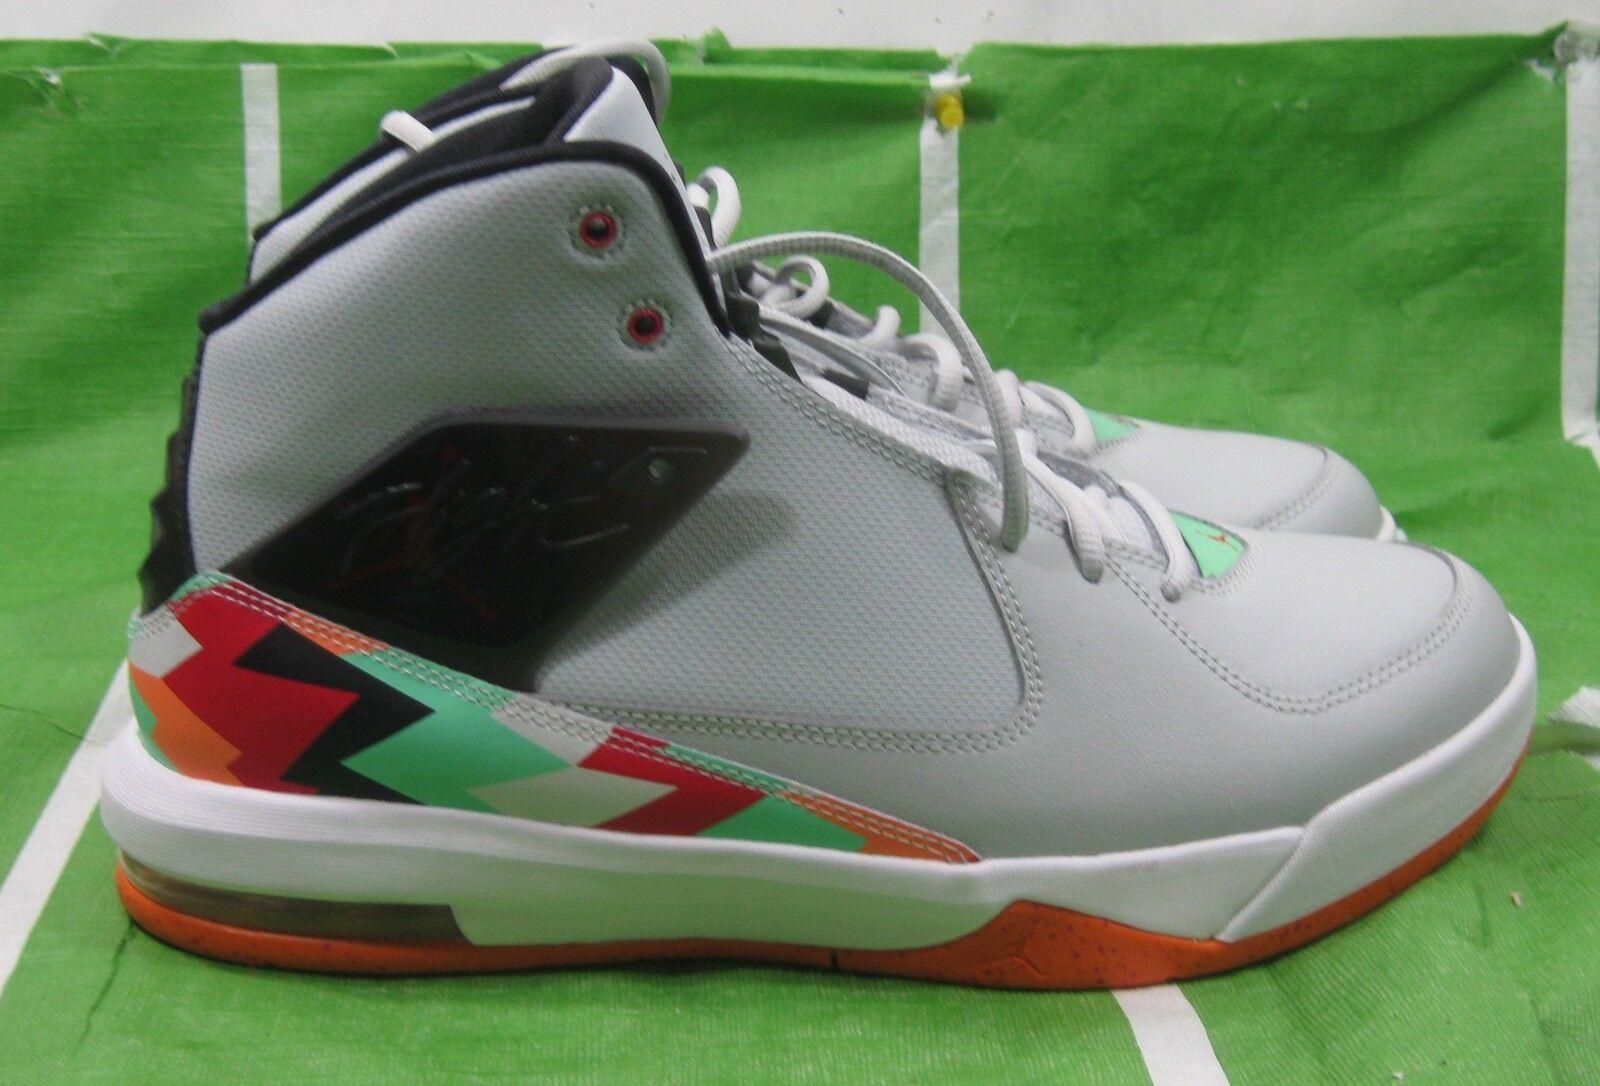 Cheap and beautiful fashion Nike 705796-015 Jordan Incline Air Sole Grey/black/red Mid Basketball Comfortable